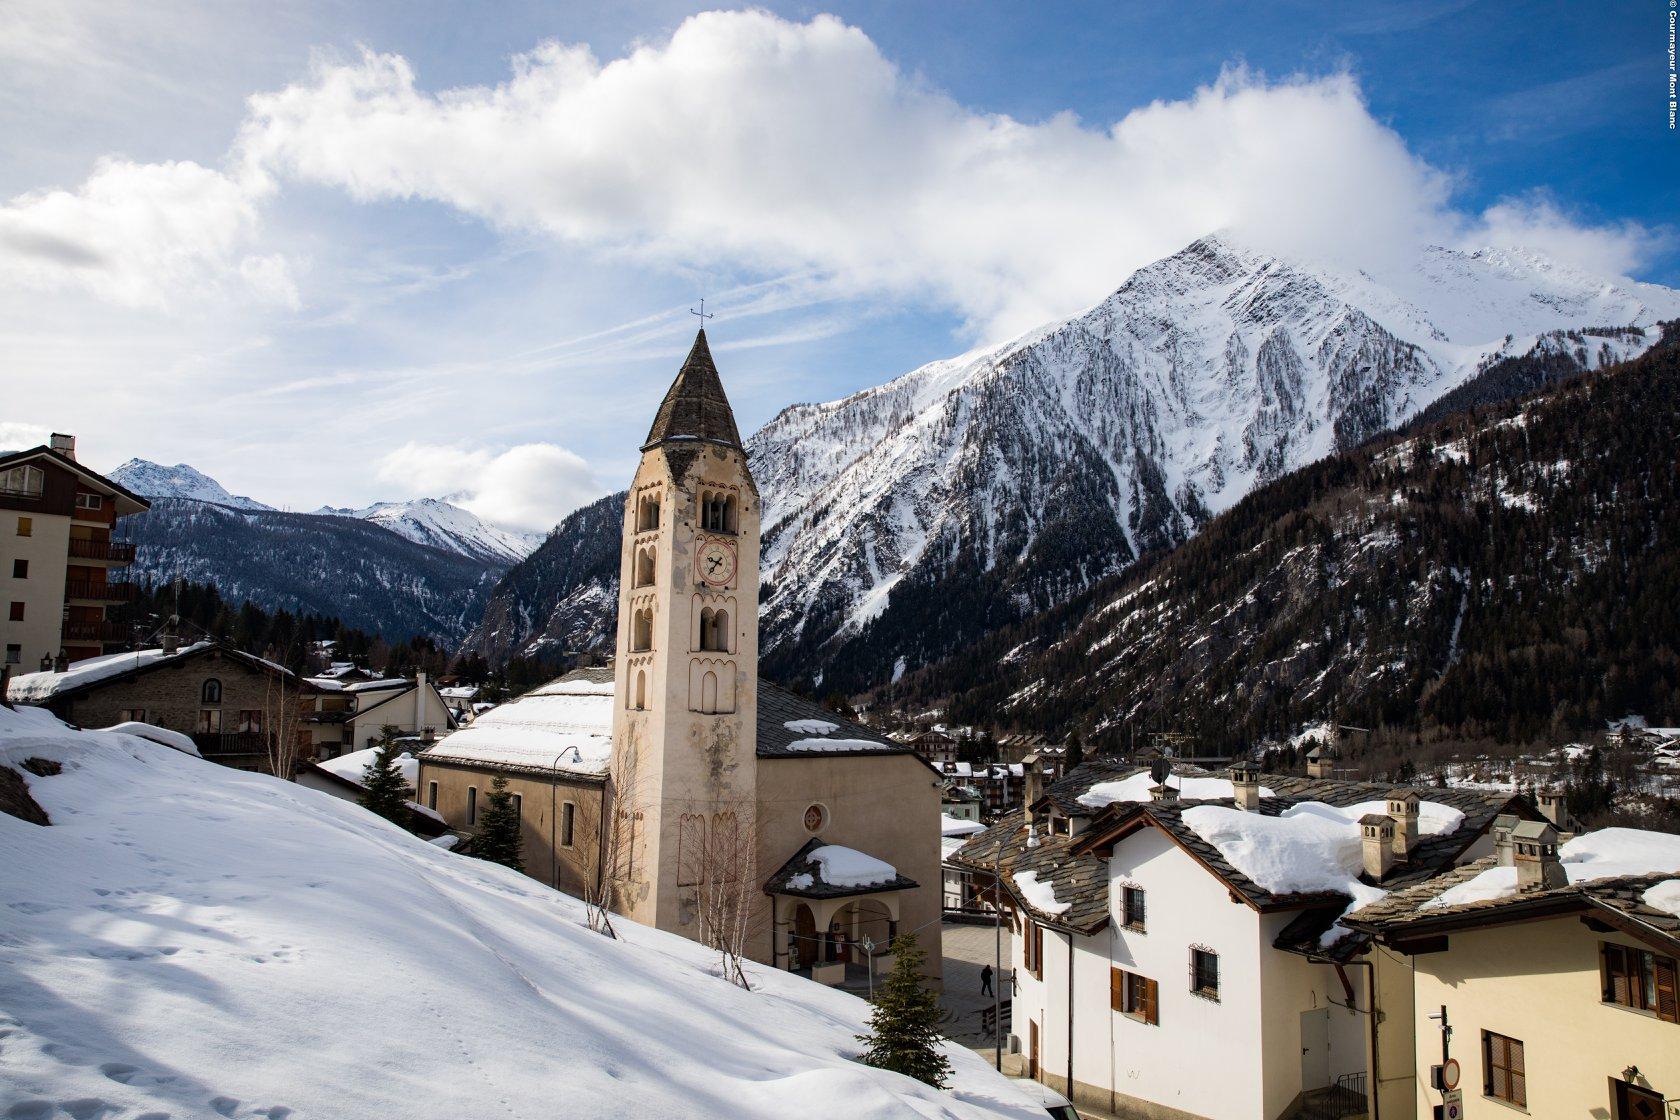 courmayeur ski trip, courmayeur ski vacation